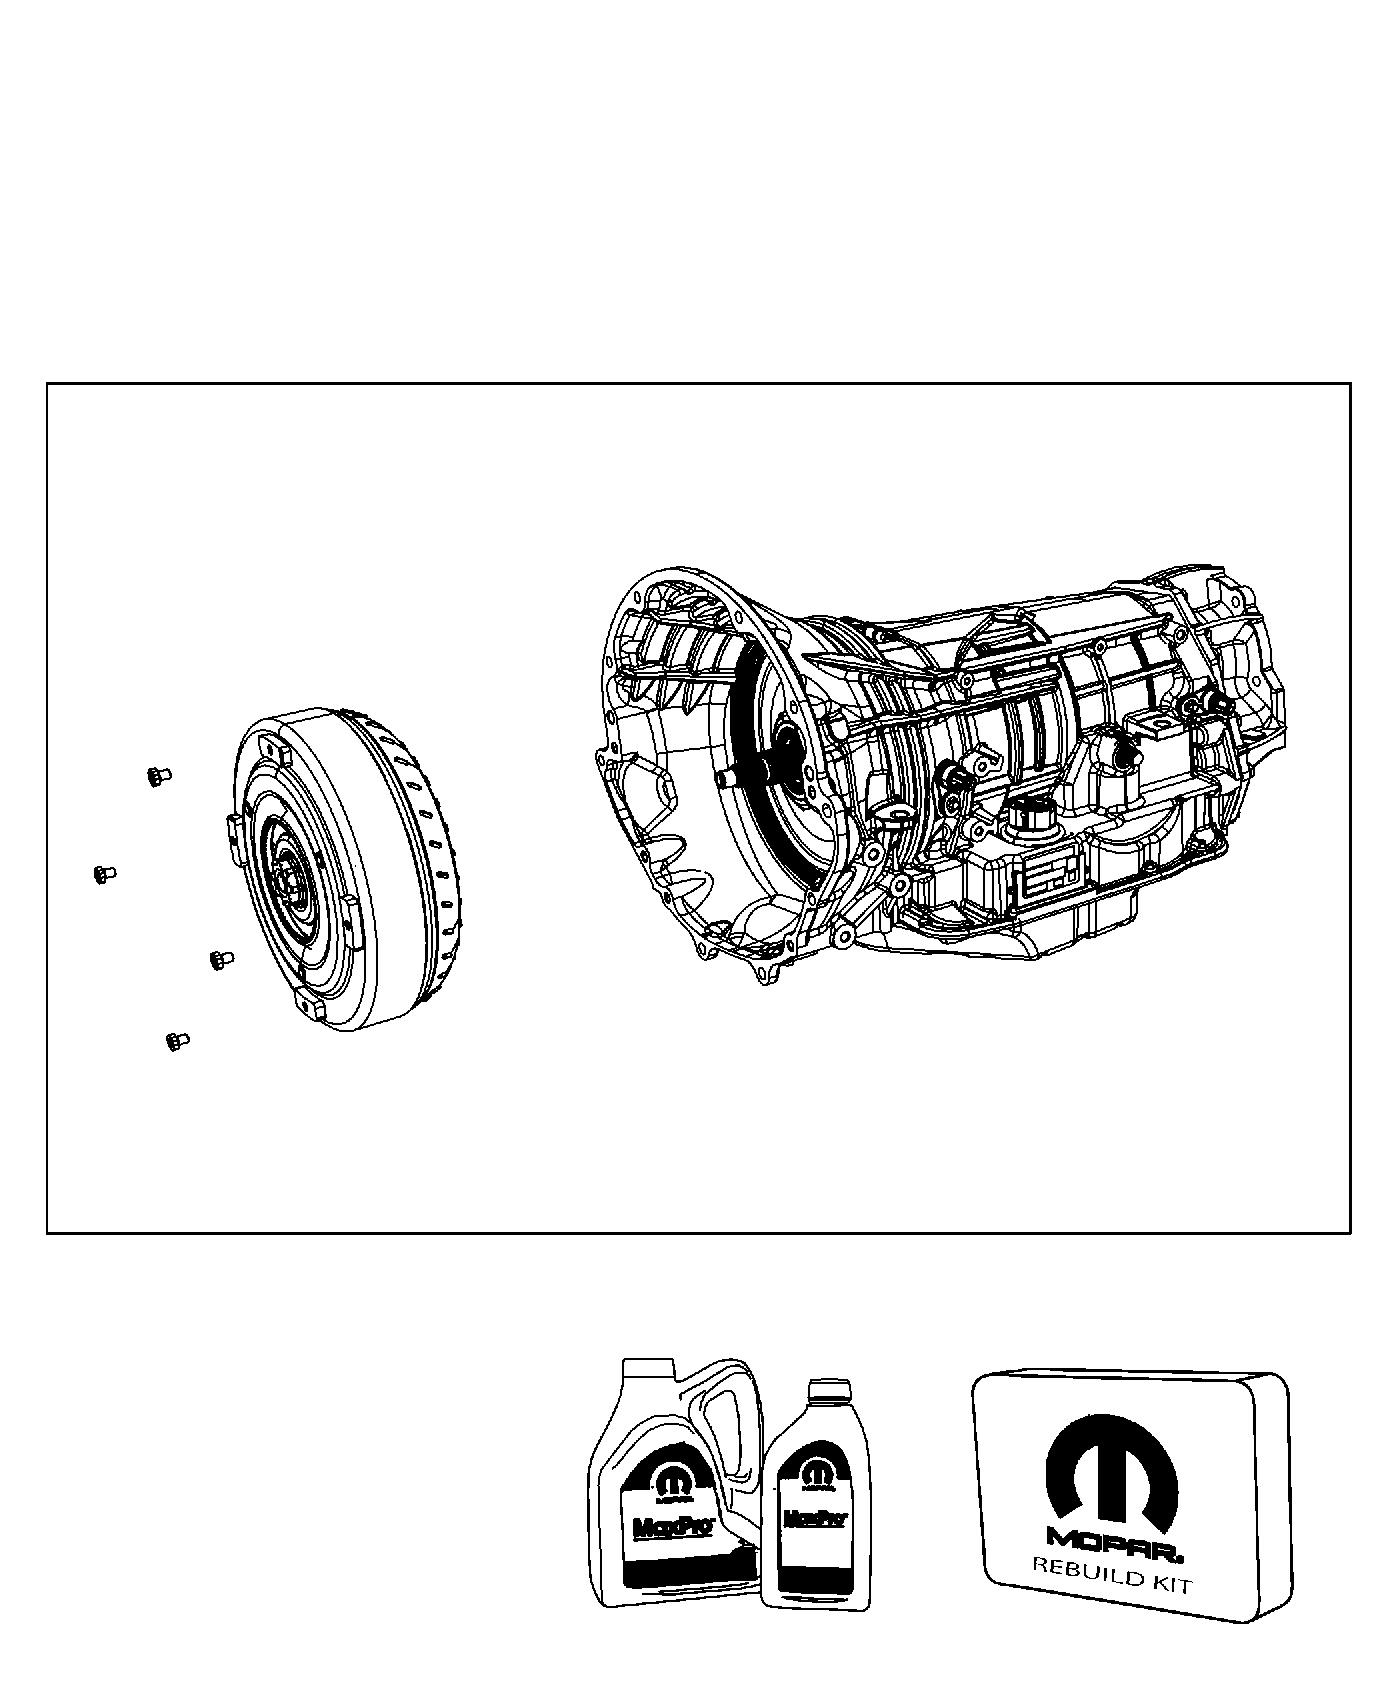 Ram 1500 Transmission kit. With torque converter